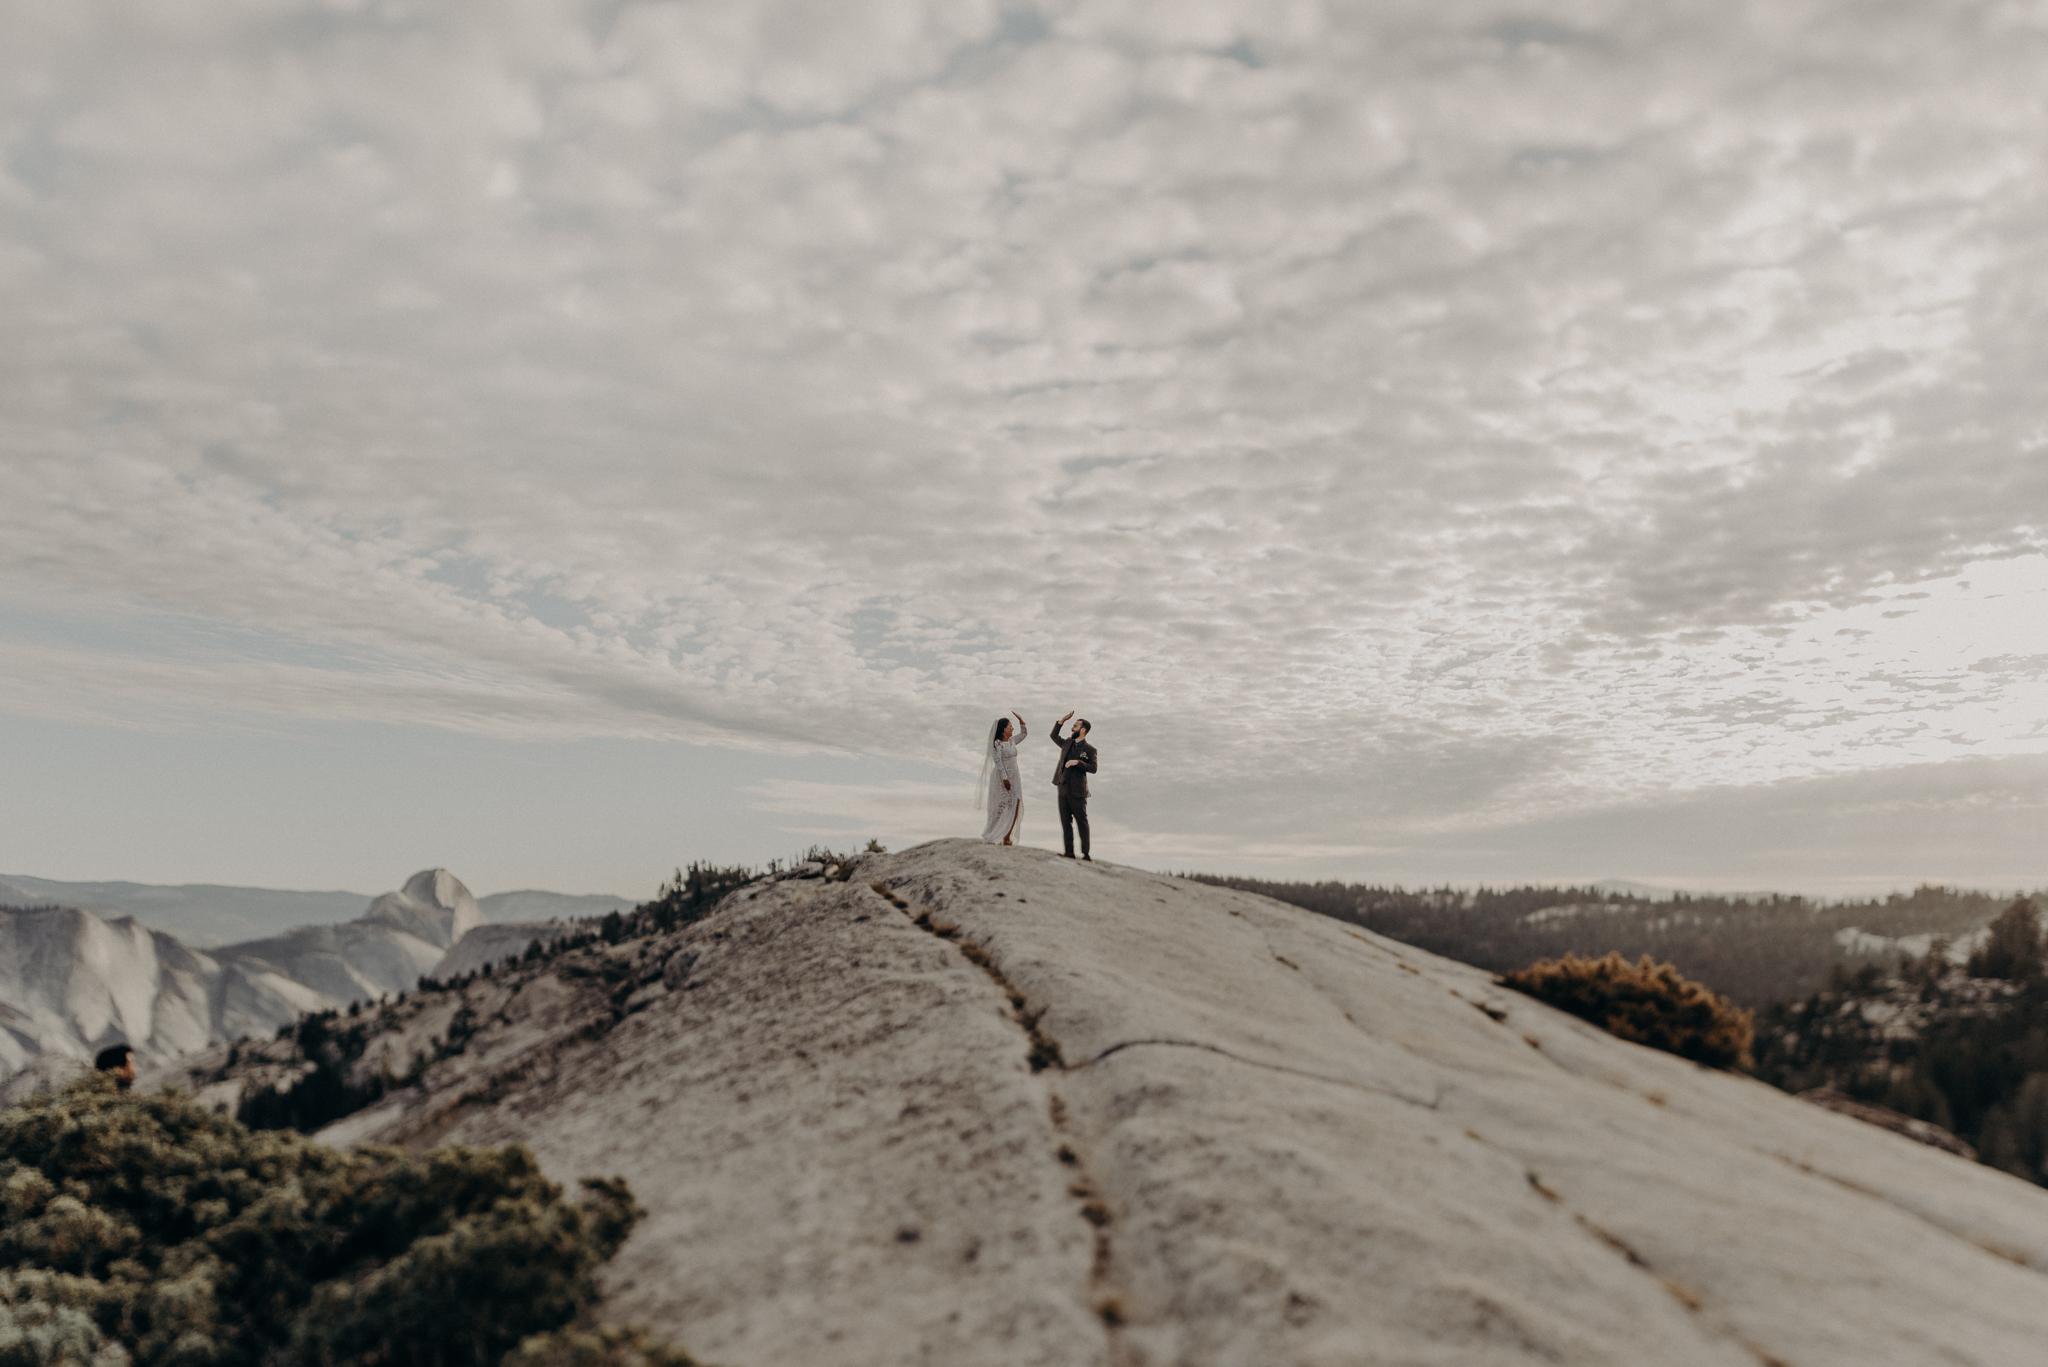 Yosemite Elopement Photographer - Evergreen Lodge Wedding Photographer - IsaiahAndTaylor.com-017.jpg